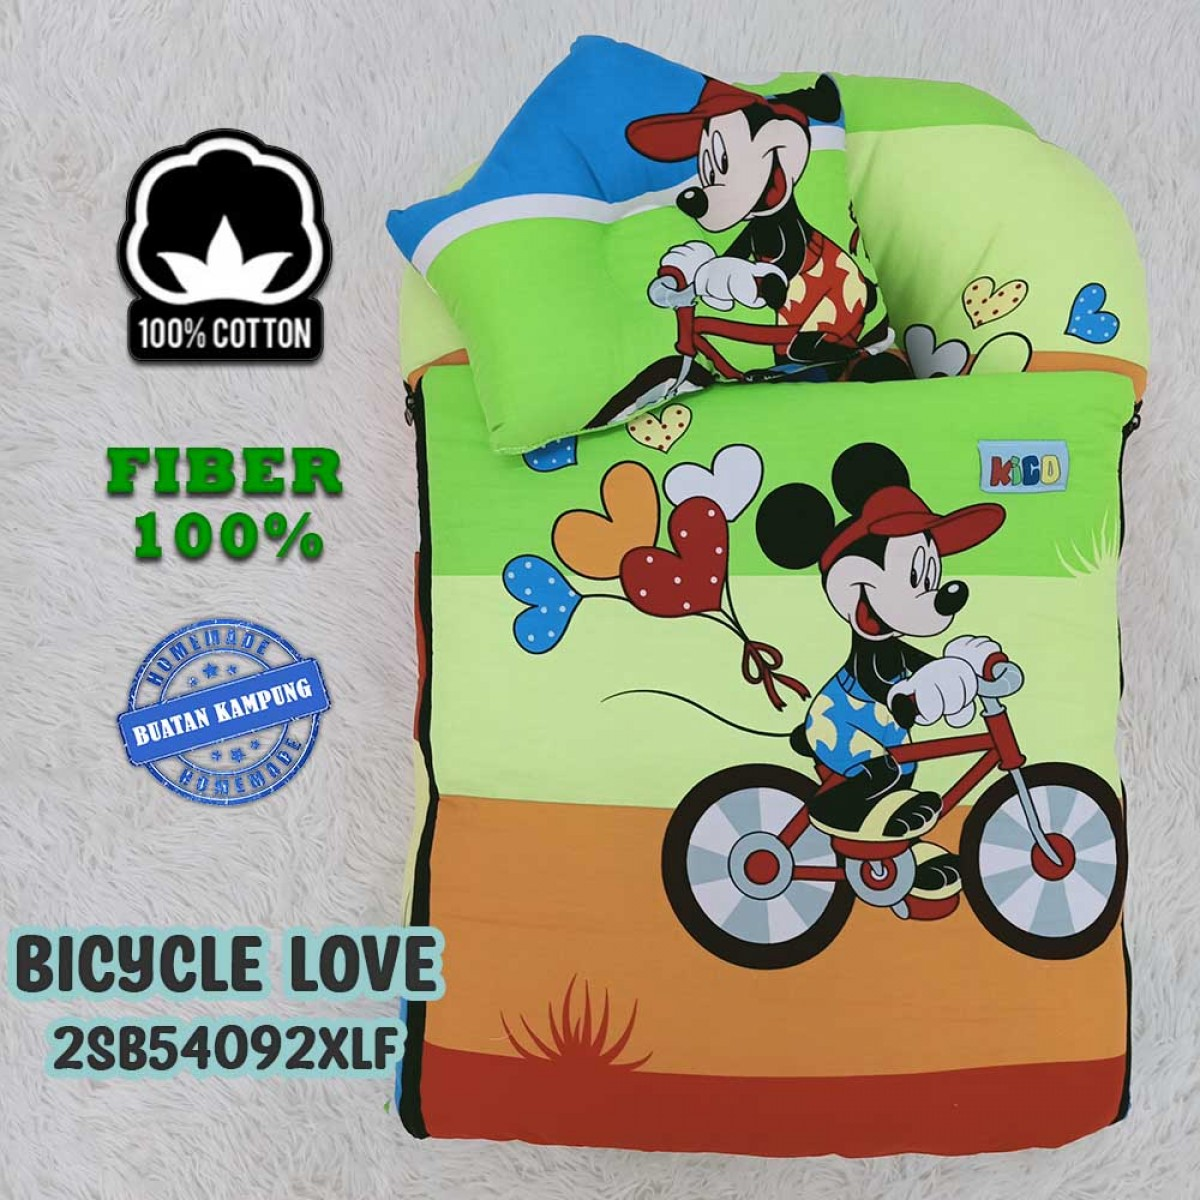 Bicycle Love - Kico Baby Center